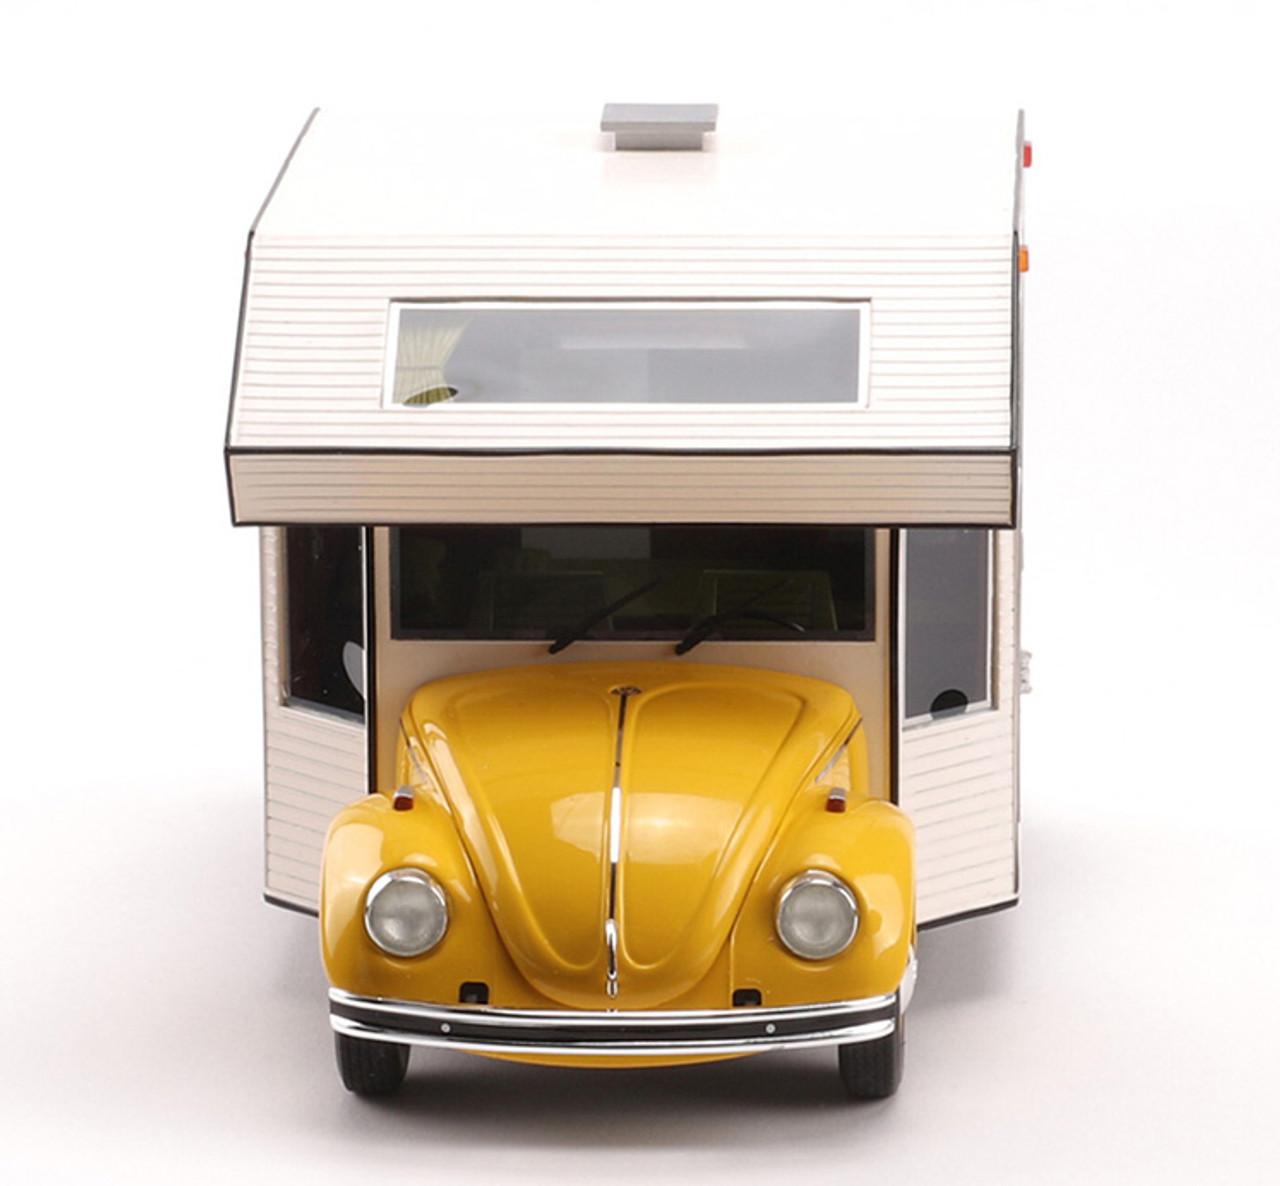 1/18 Schuco Volkswagen VW Kaefer Beetle RV Camper (Yellow) Diecast Car Model